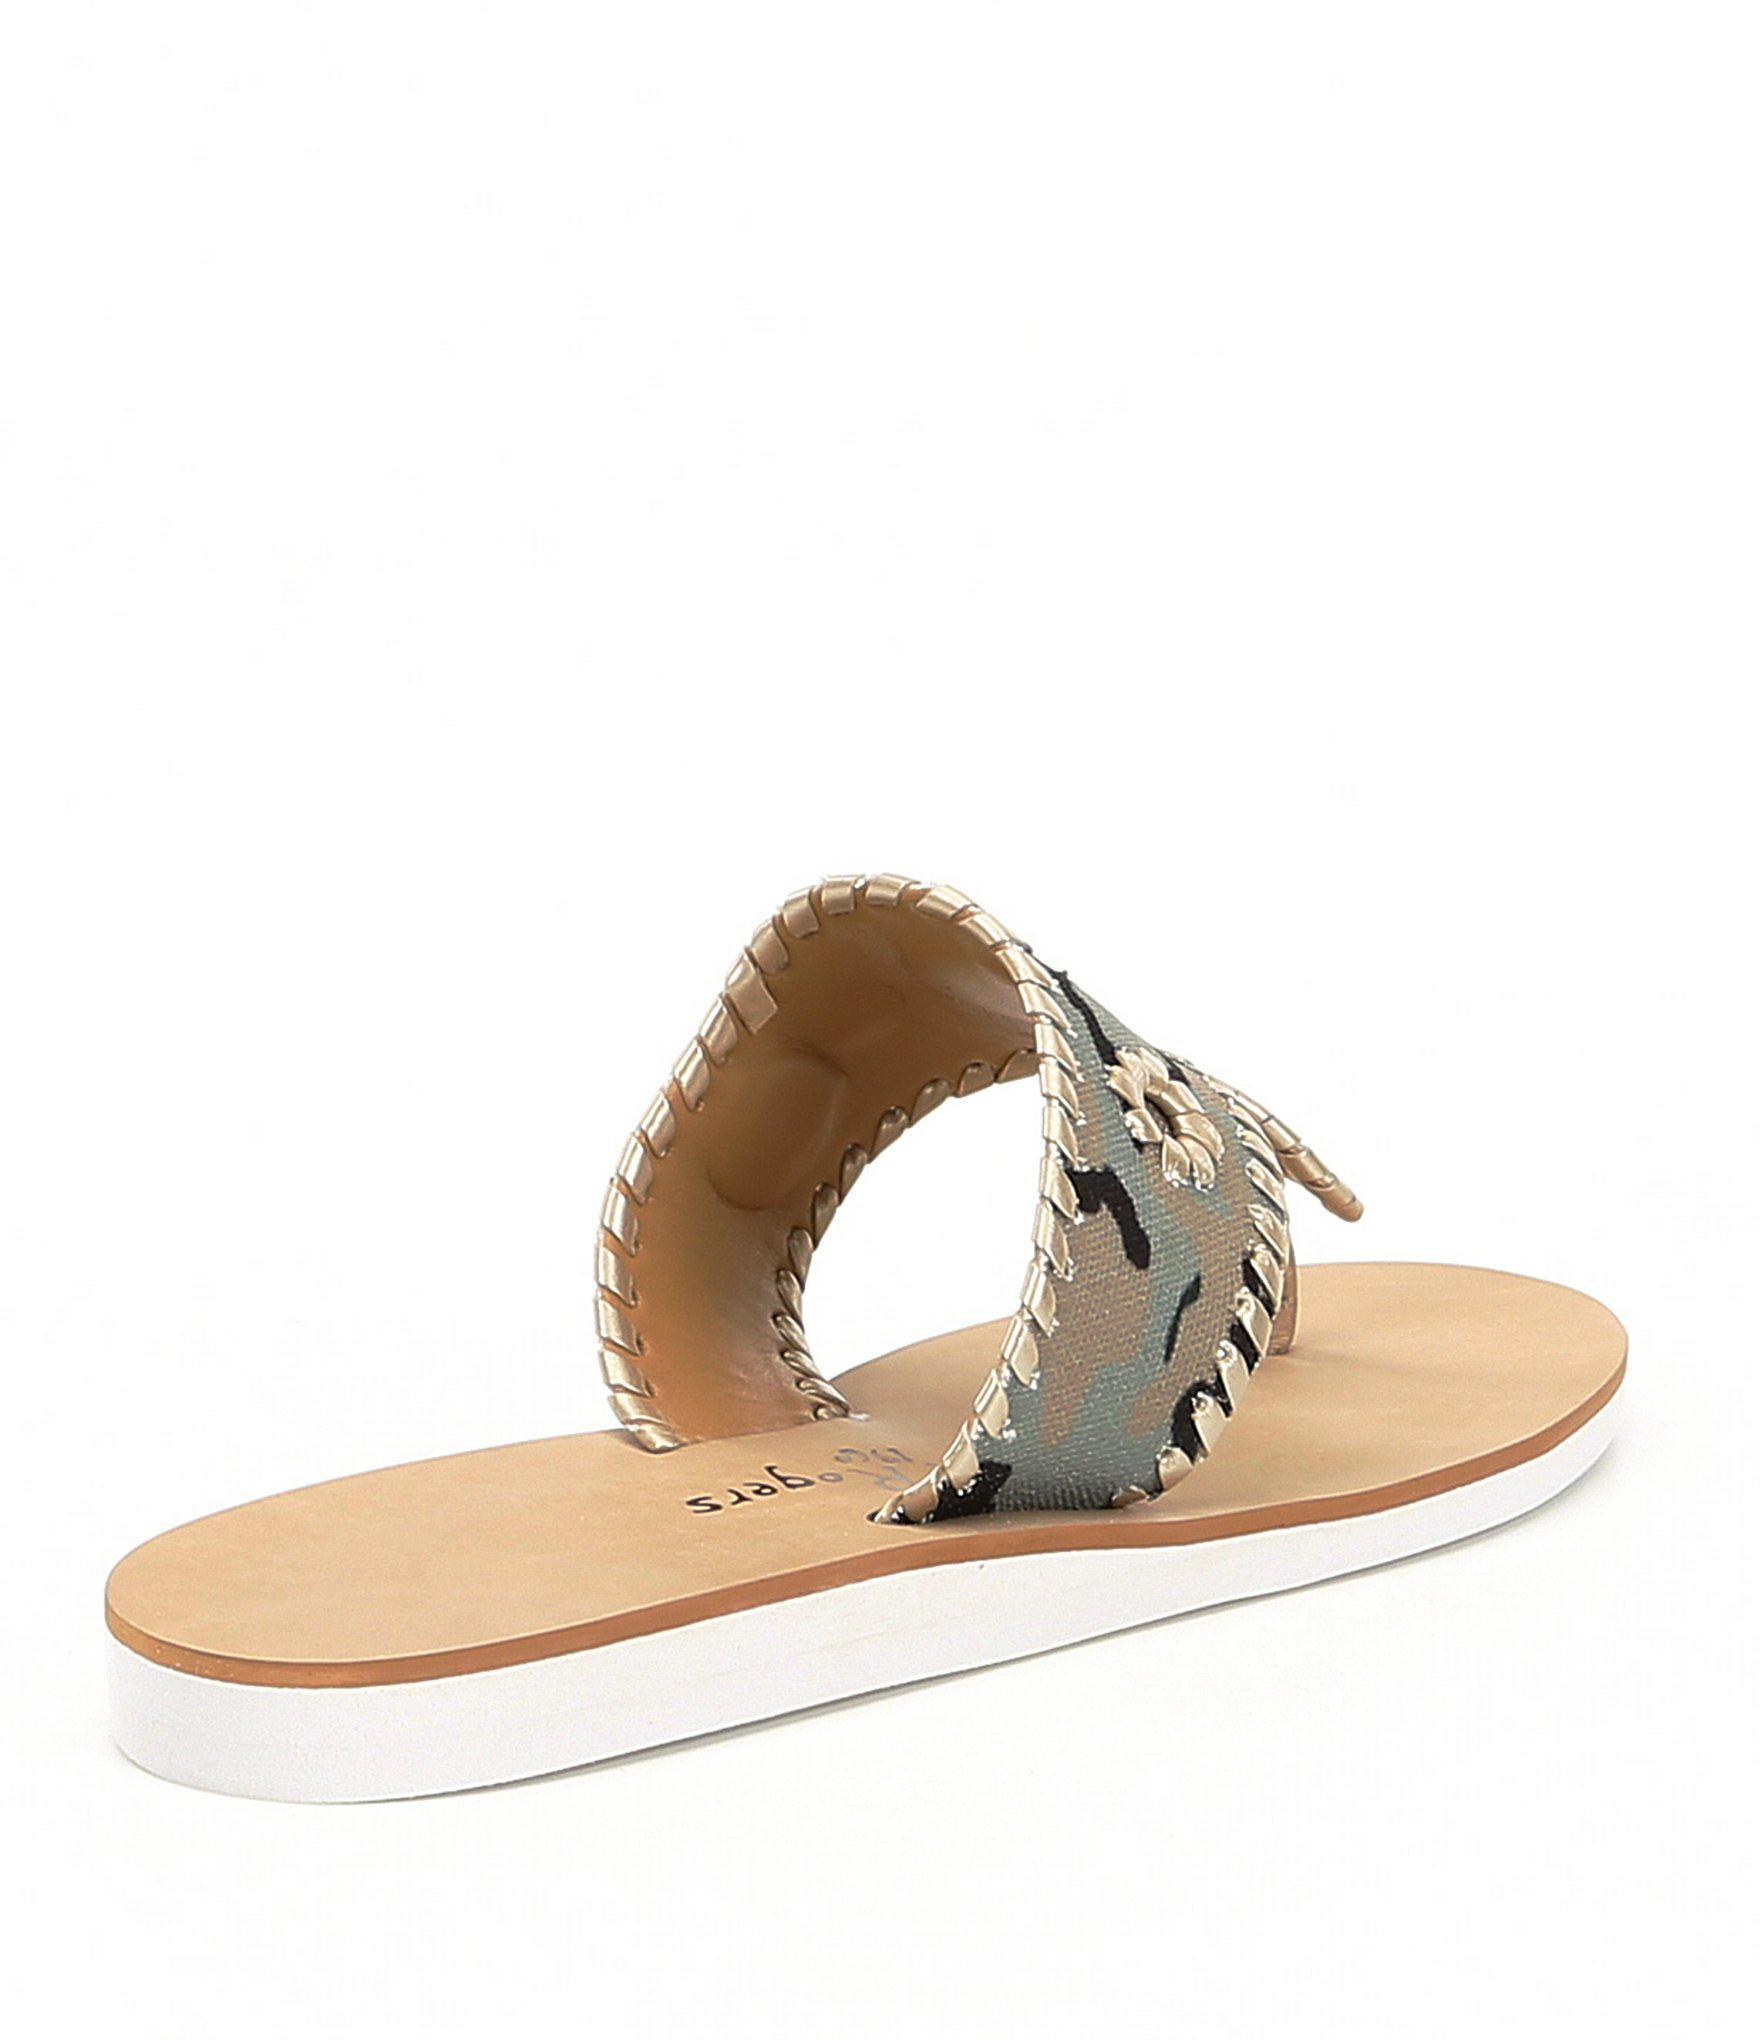 1b441b543bdbf Jack Rogers Captiva Camo Printed Sandals - Lyst